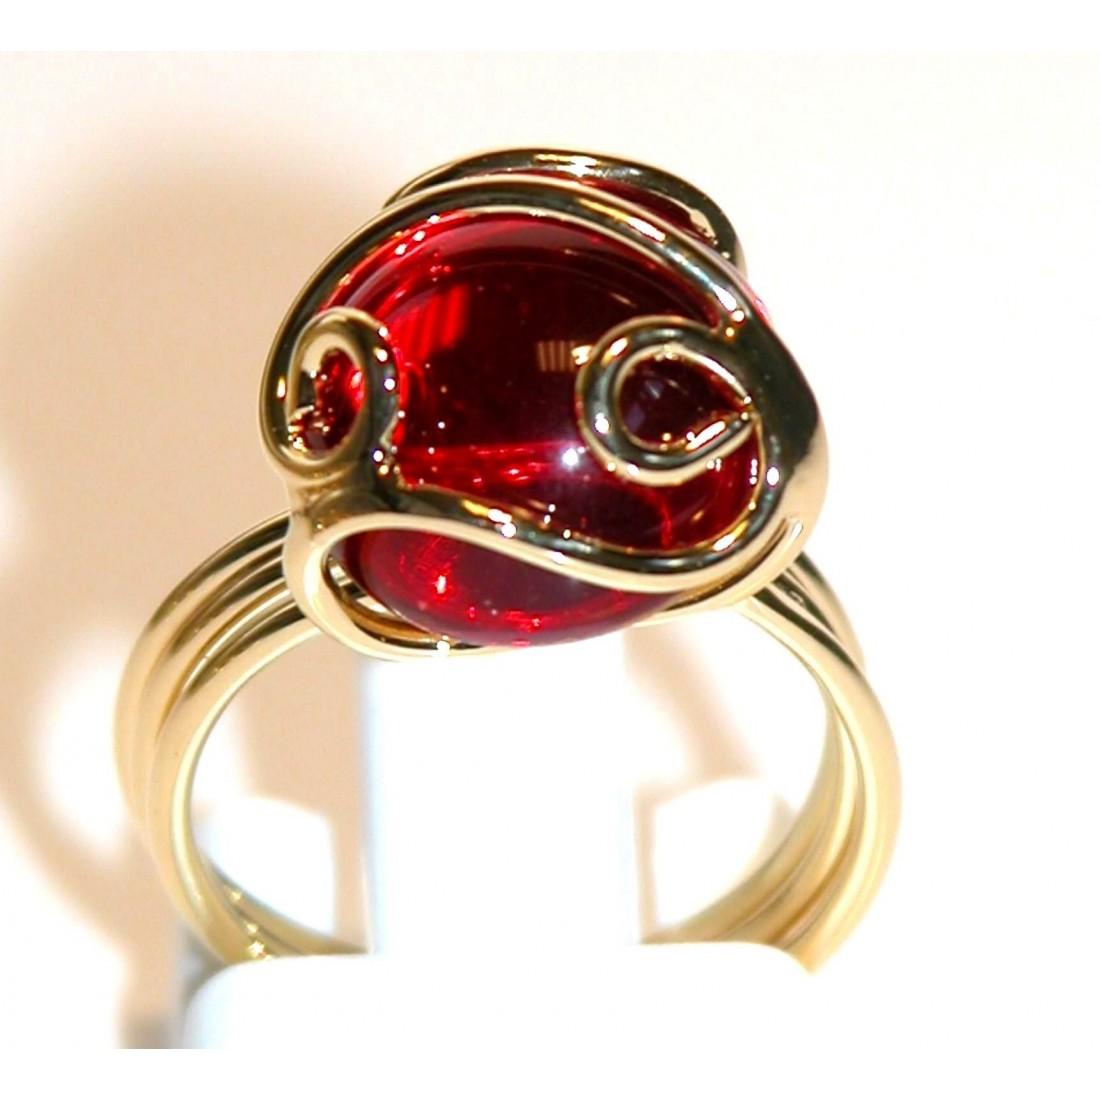 Bague fantaisie artisanale avec une pierre rouge. Bijou artisanal made in France.